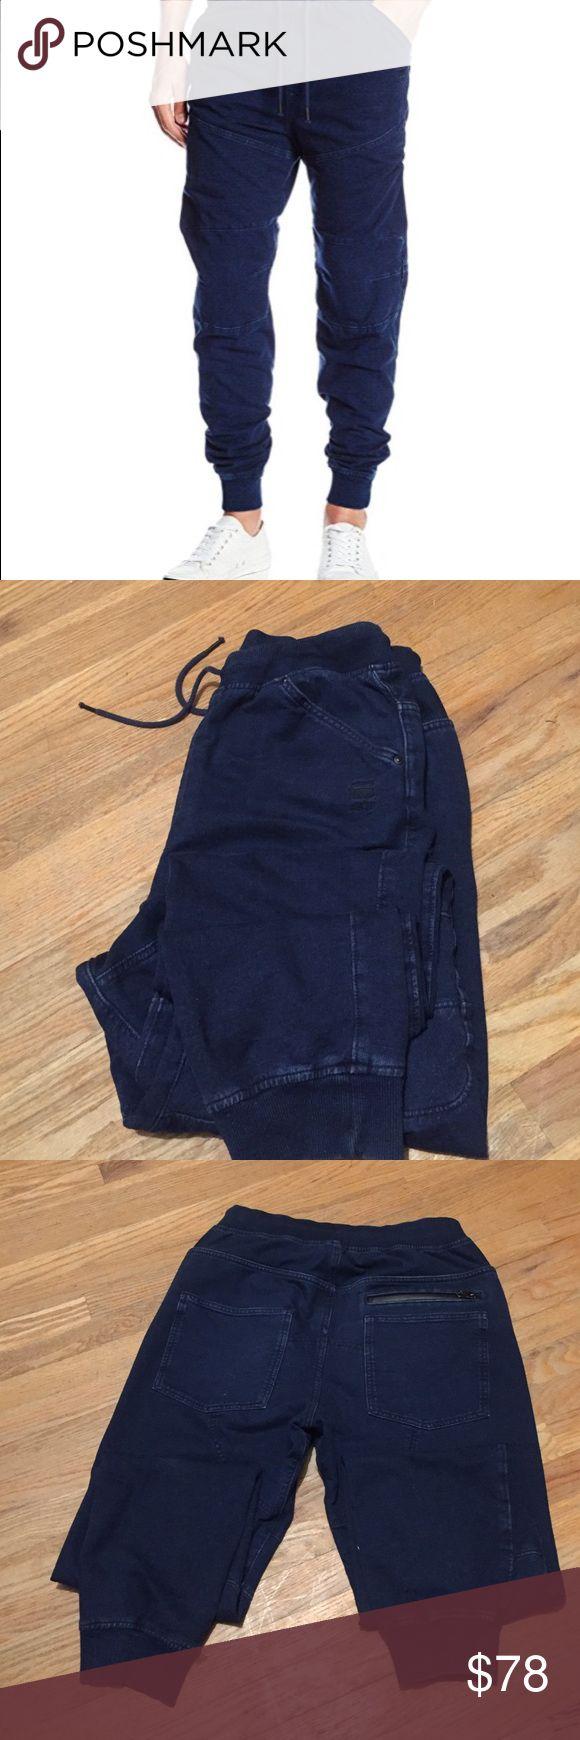 G-Star Raw Men's Kensetsu Sweat Pants. Indigo Hard to find G-Star Raw joggers.  Indigo Dark Aged. Size large. Big comfy pants. Pre-0wned look new. G-Star Raw Pants Track Pants & Joggers